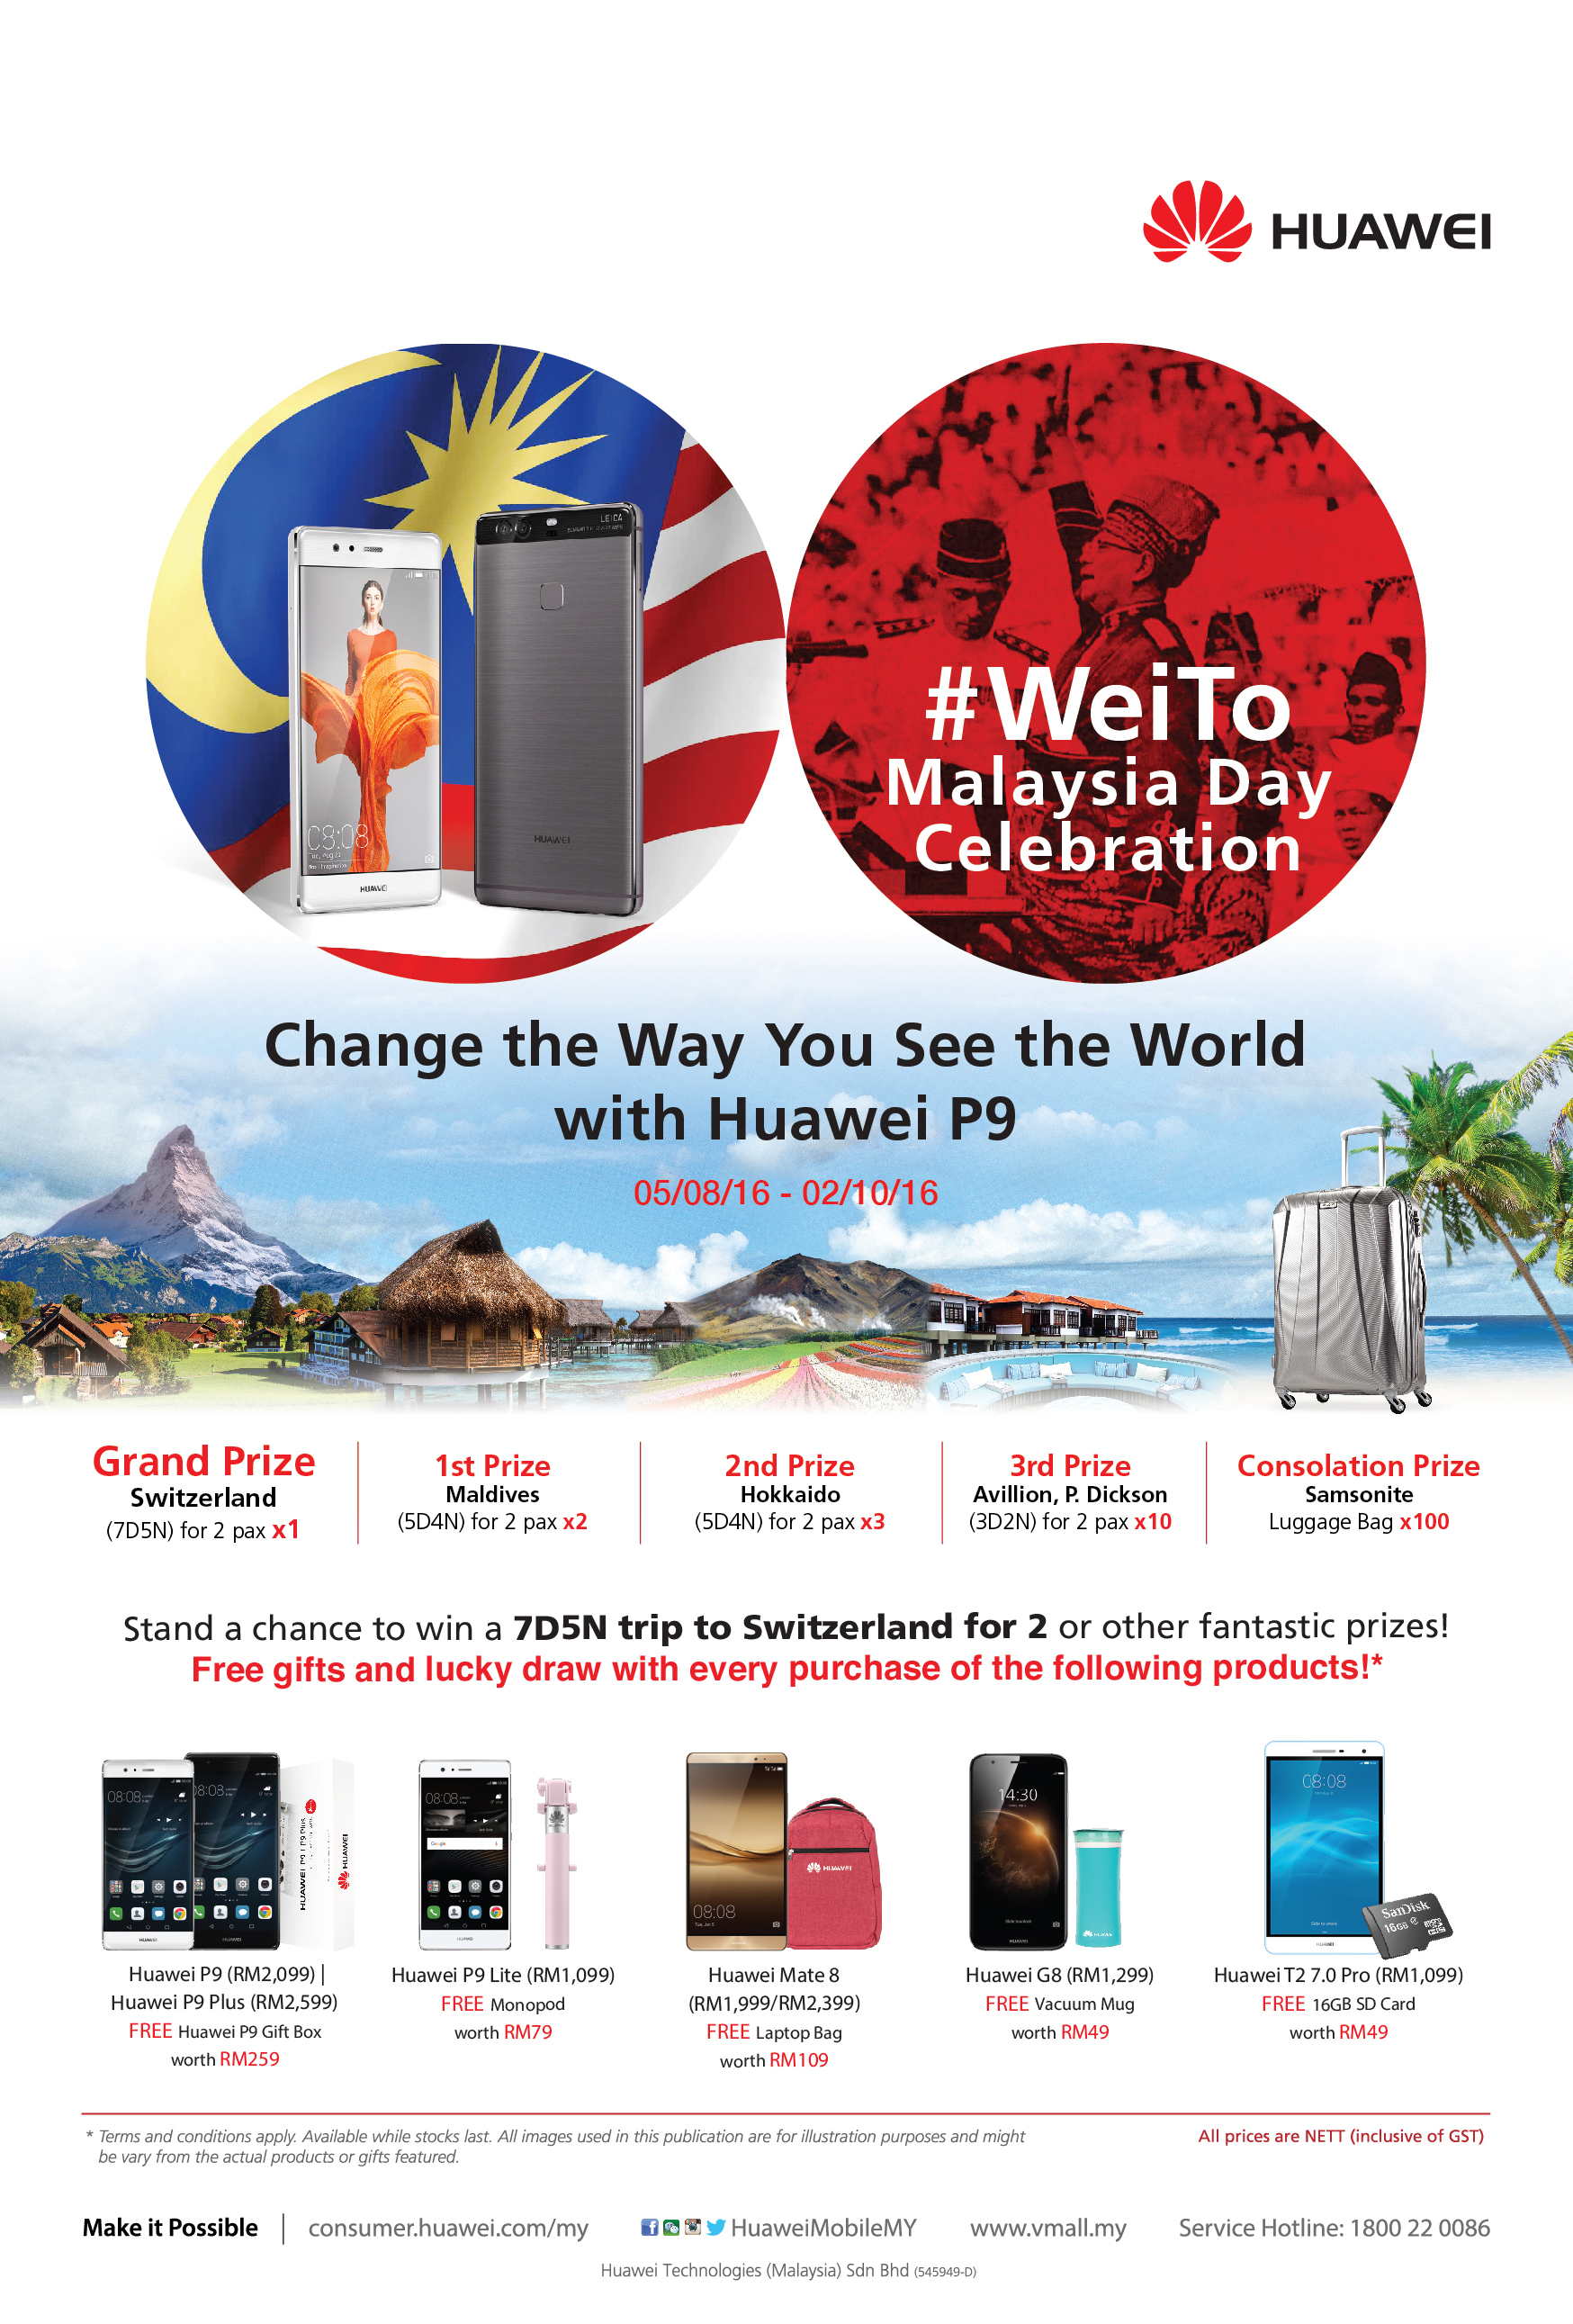 Huawei #WeiTo Malaysia Day Celebration_2